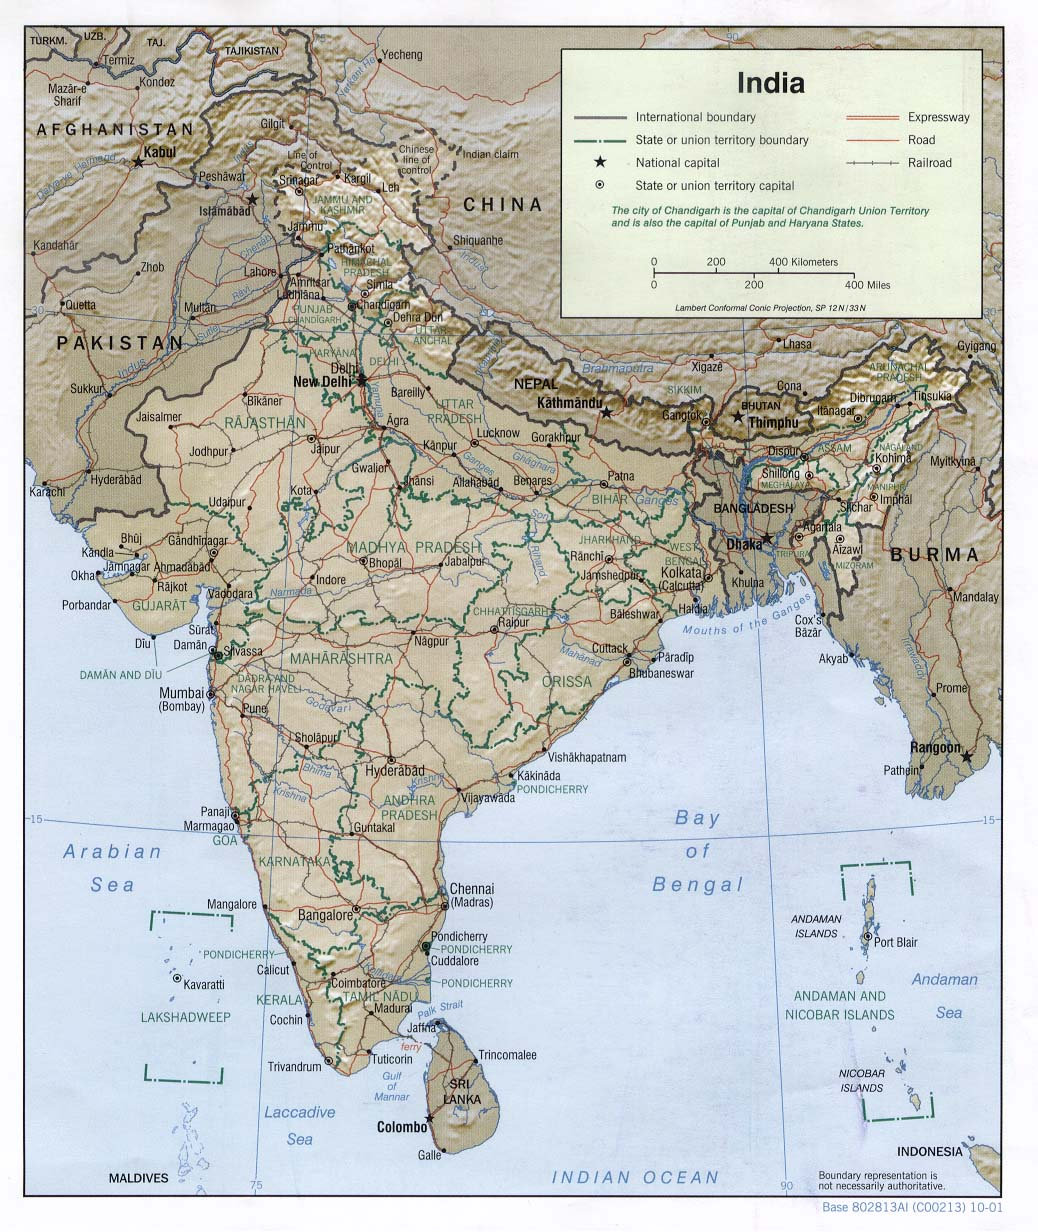 Helpinfo mapmap indiaindia map poinitng with riversmap google mapmap indiaindia map poinitng with riversmap googlemap india statesmap india politicalworld mapmap of indiaindia road mapsindian railways gumiabroncs Image collections